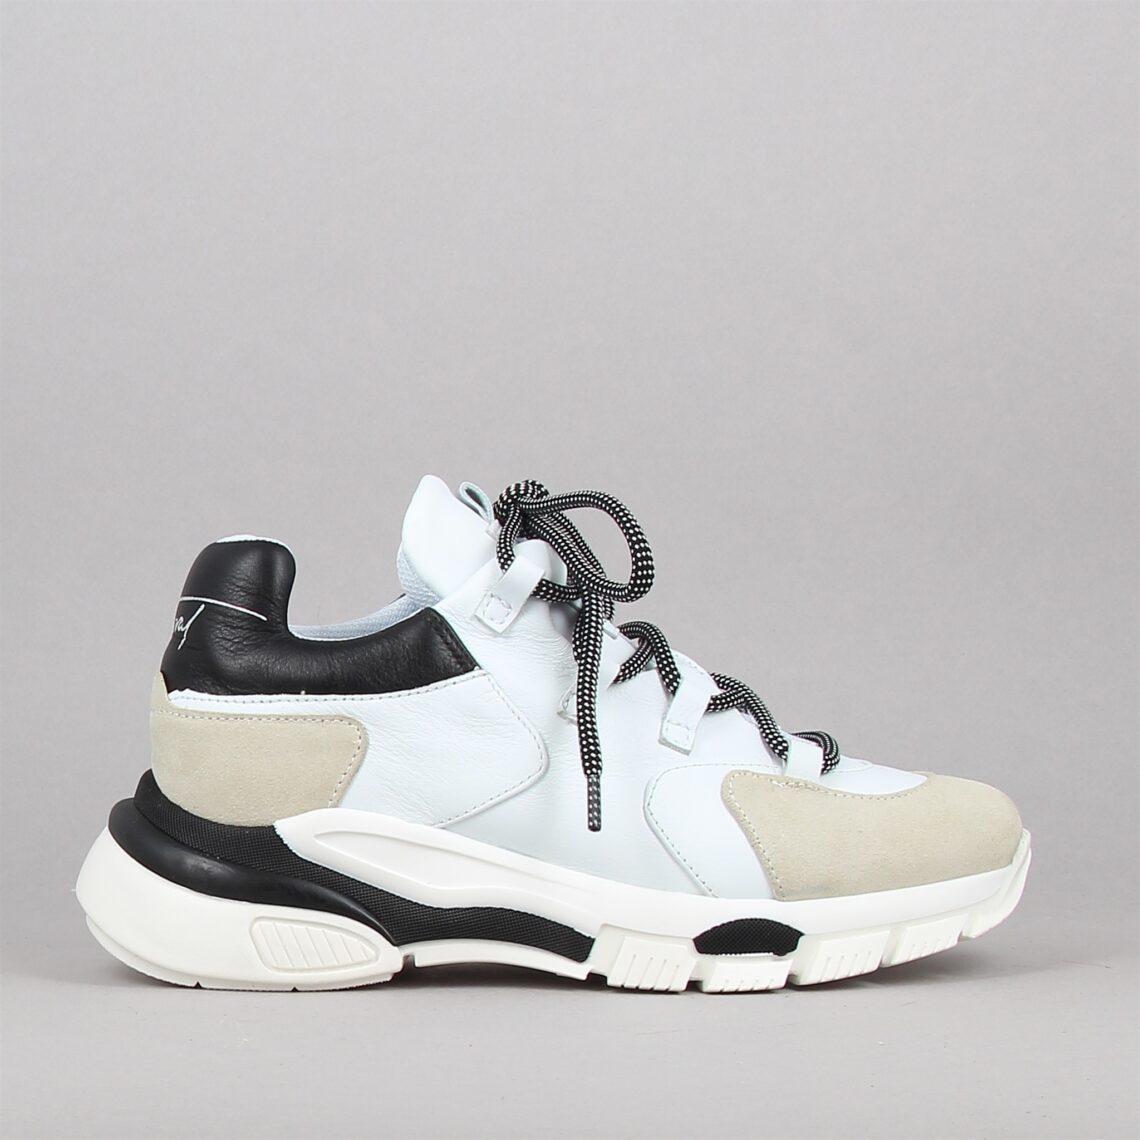 11101-blanc-174669826-0.jpg